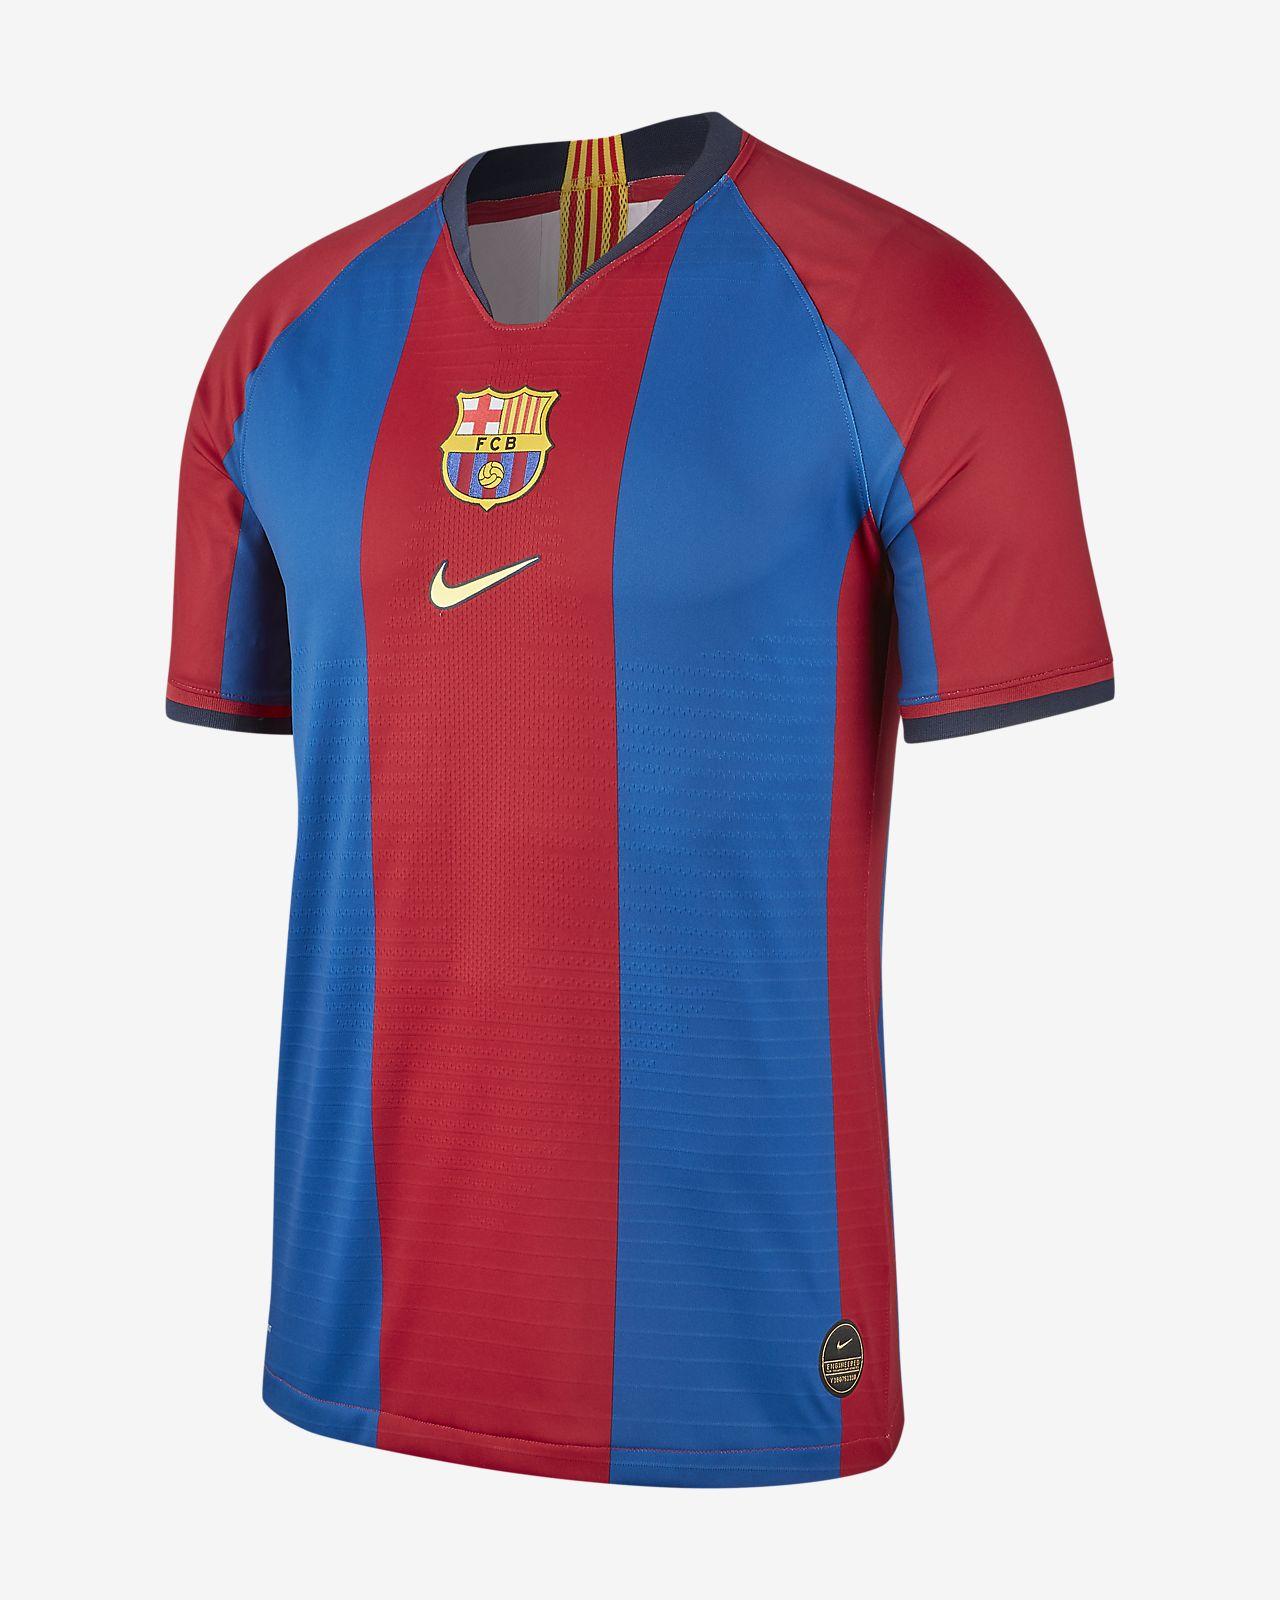 10cd5fe262c FC Barcelona Vapor Match  98 99 Men s Football Shirt. Nike.com GB